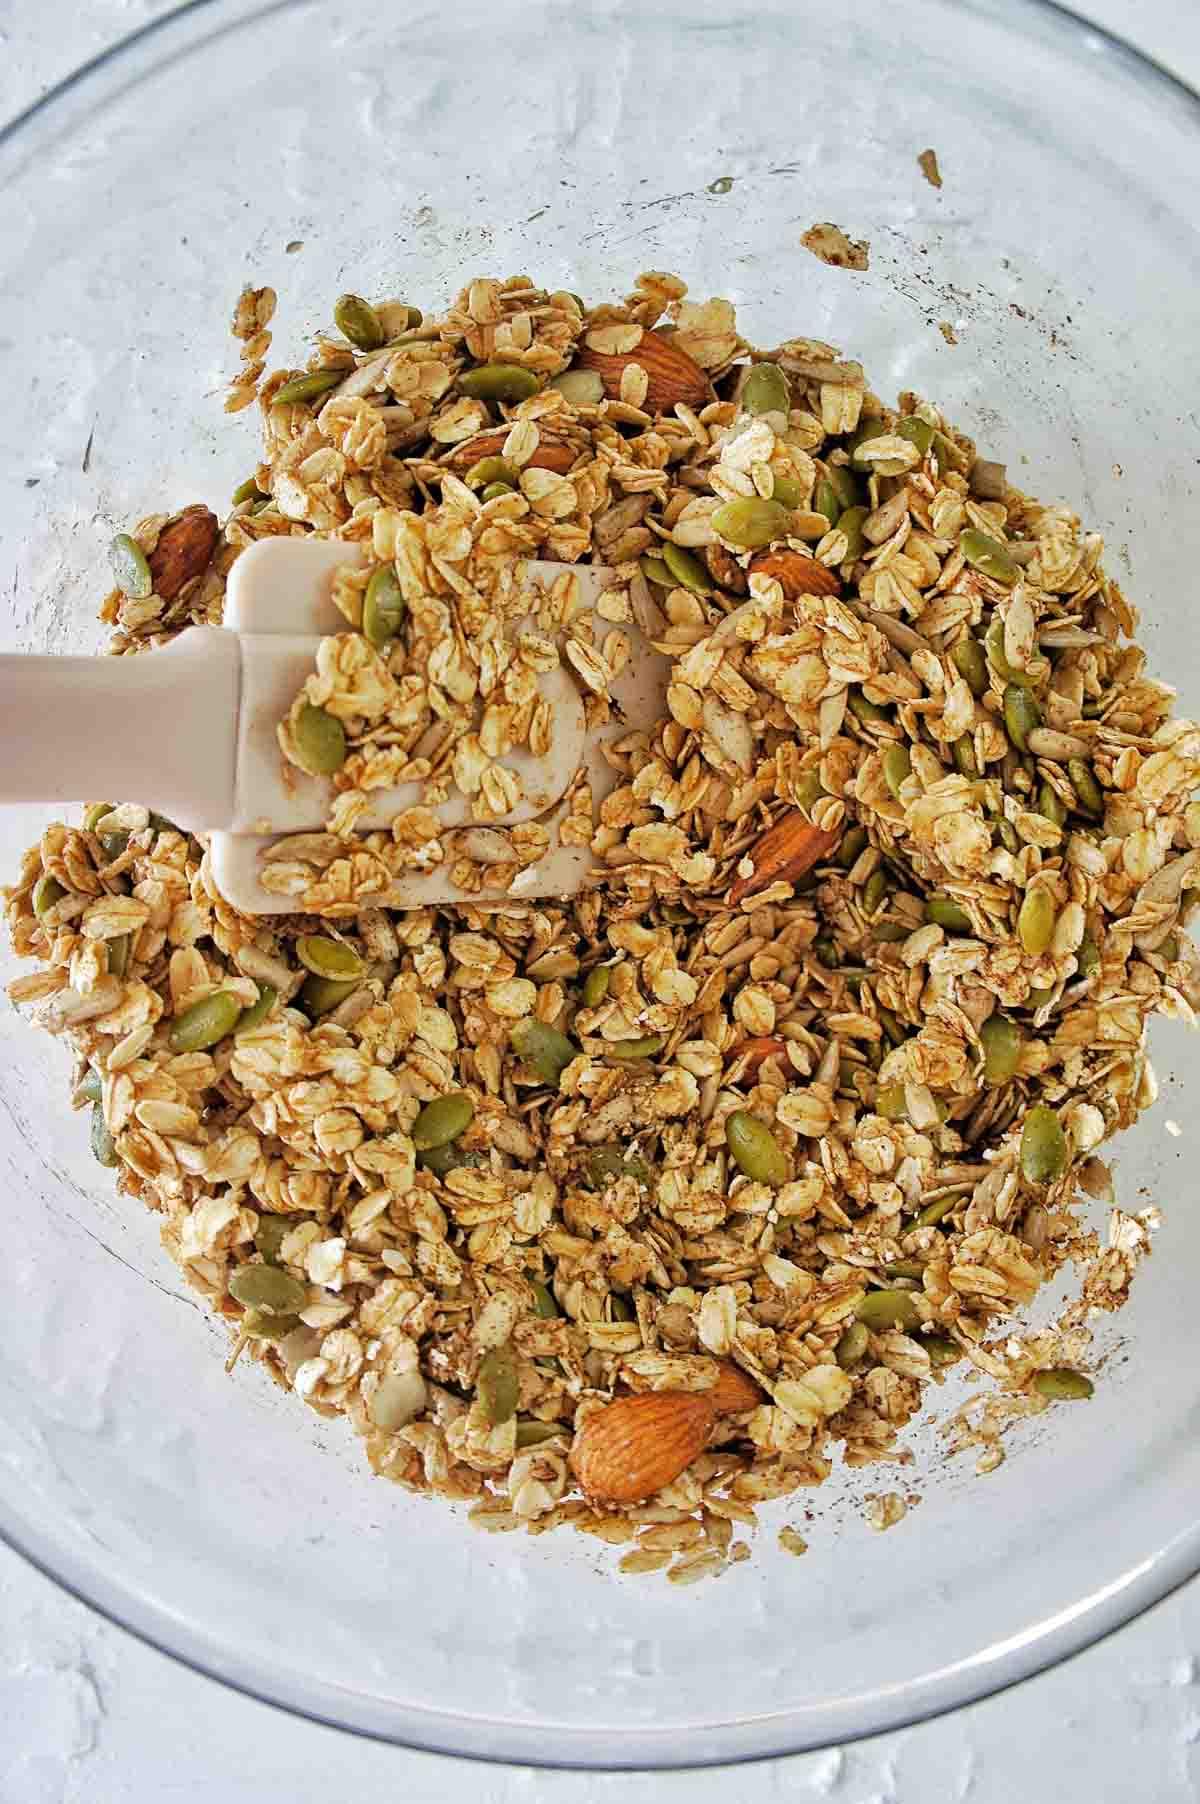 Homemade Coconut Granola 02 | Sweet Caramel Sunday